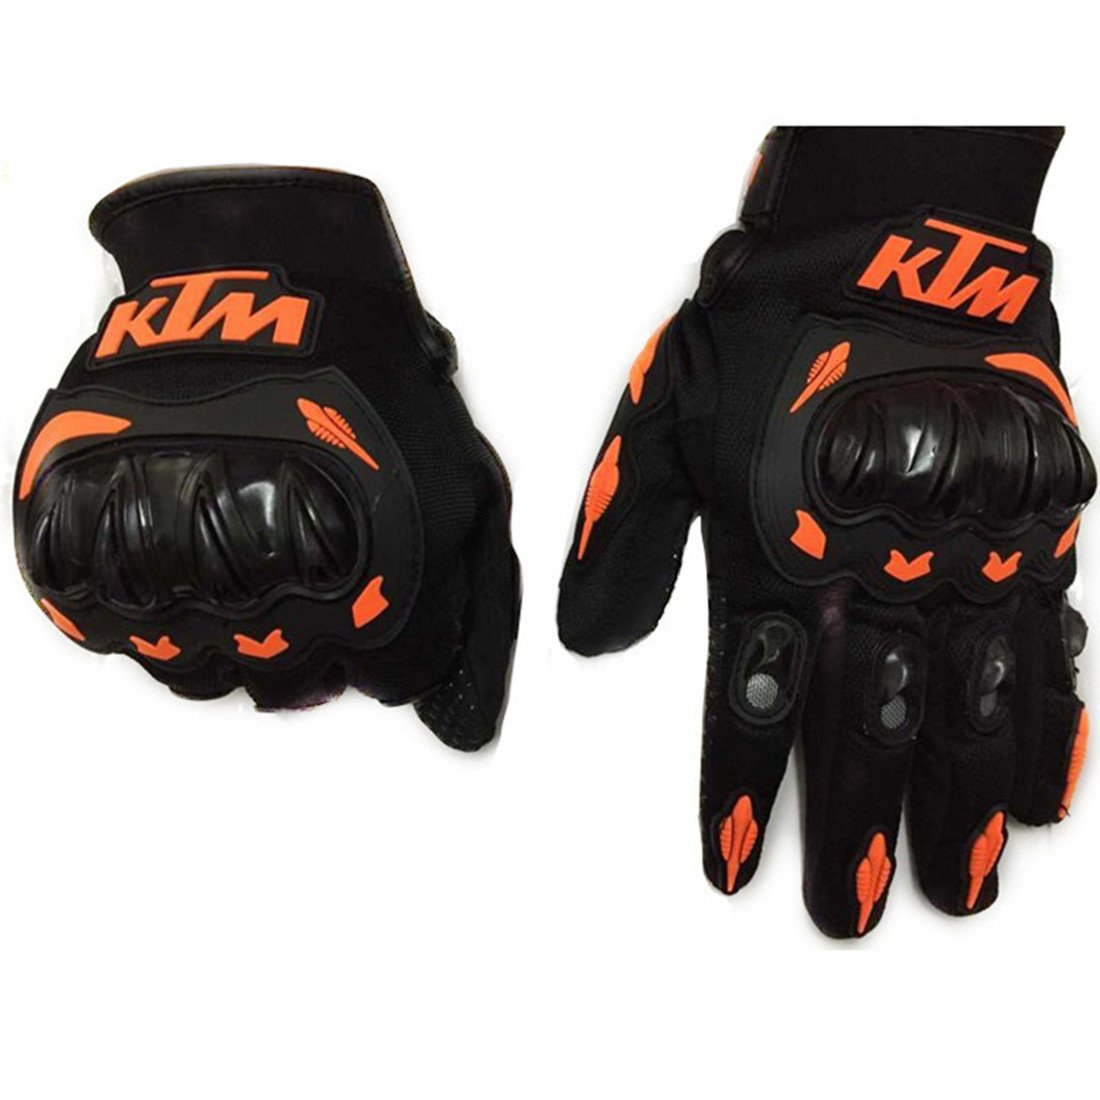 Motorcycle gloves xl - Amazon Com Motorcycle Gloves Ktm Kawasaki Men Cycling Racing Moto Glove Motorbike Full Finger Bike Protect Motocicleta Guantes Luvas Sports Outdoors